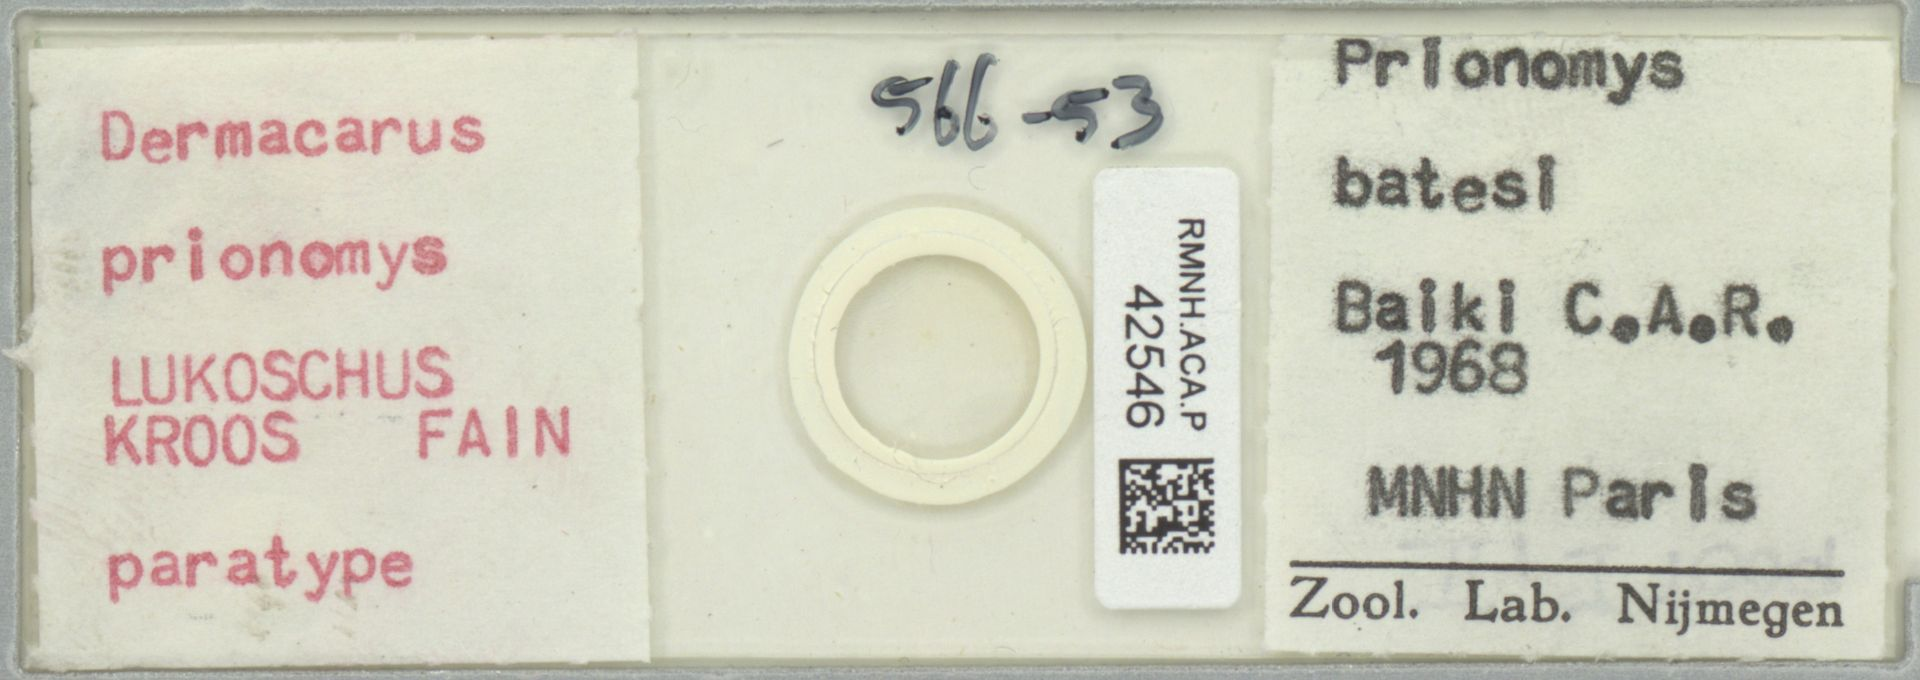 RMNH.ACA.P.42546   Dermacarus prionomys Lukoschus, Kroos & Fain